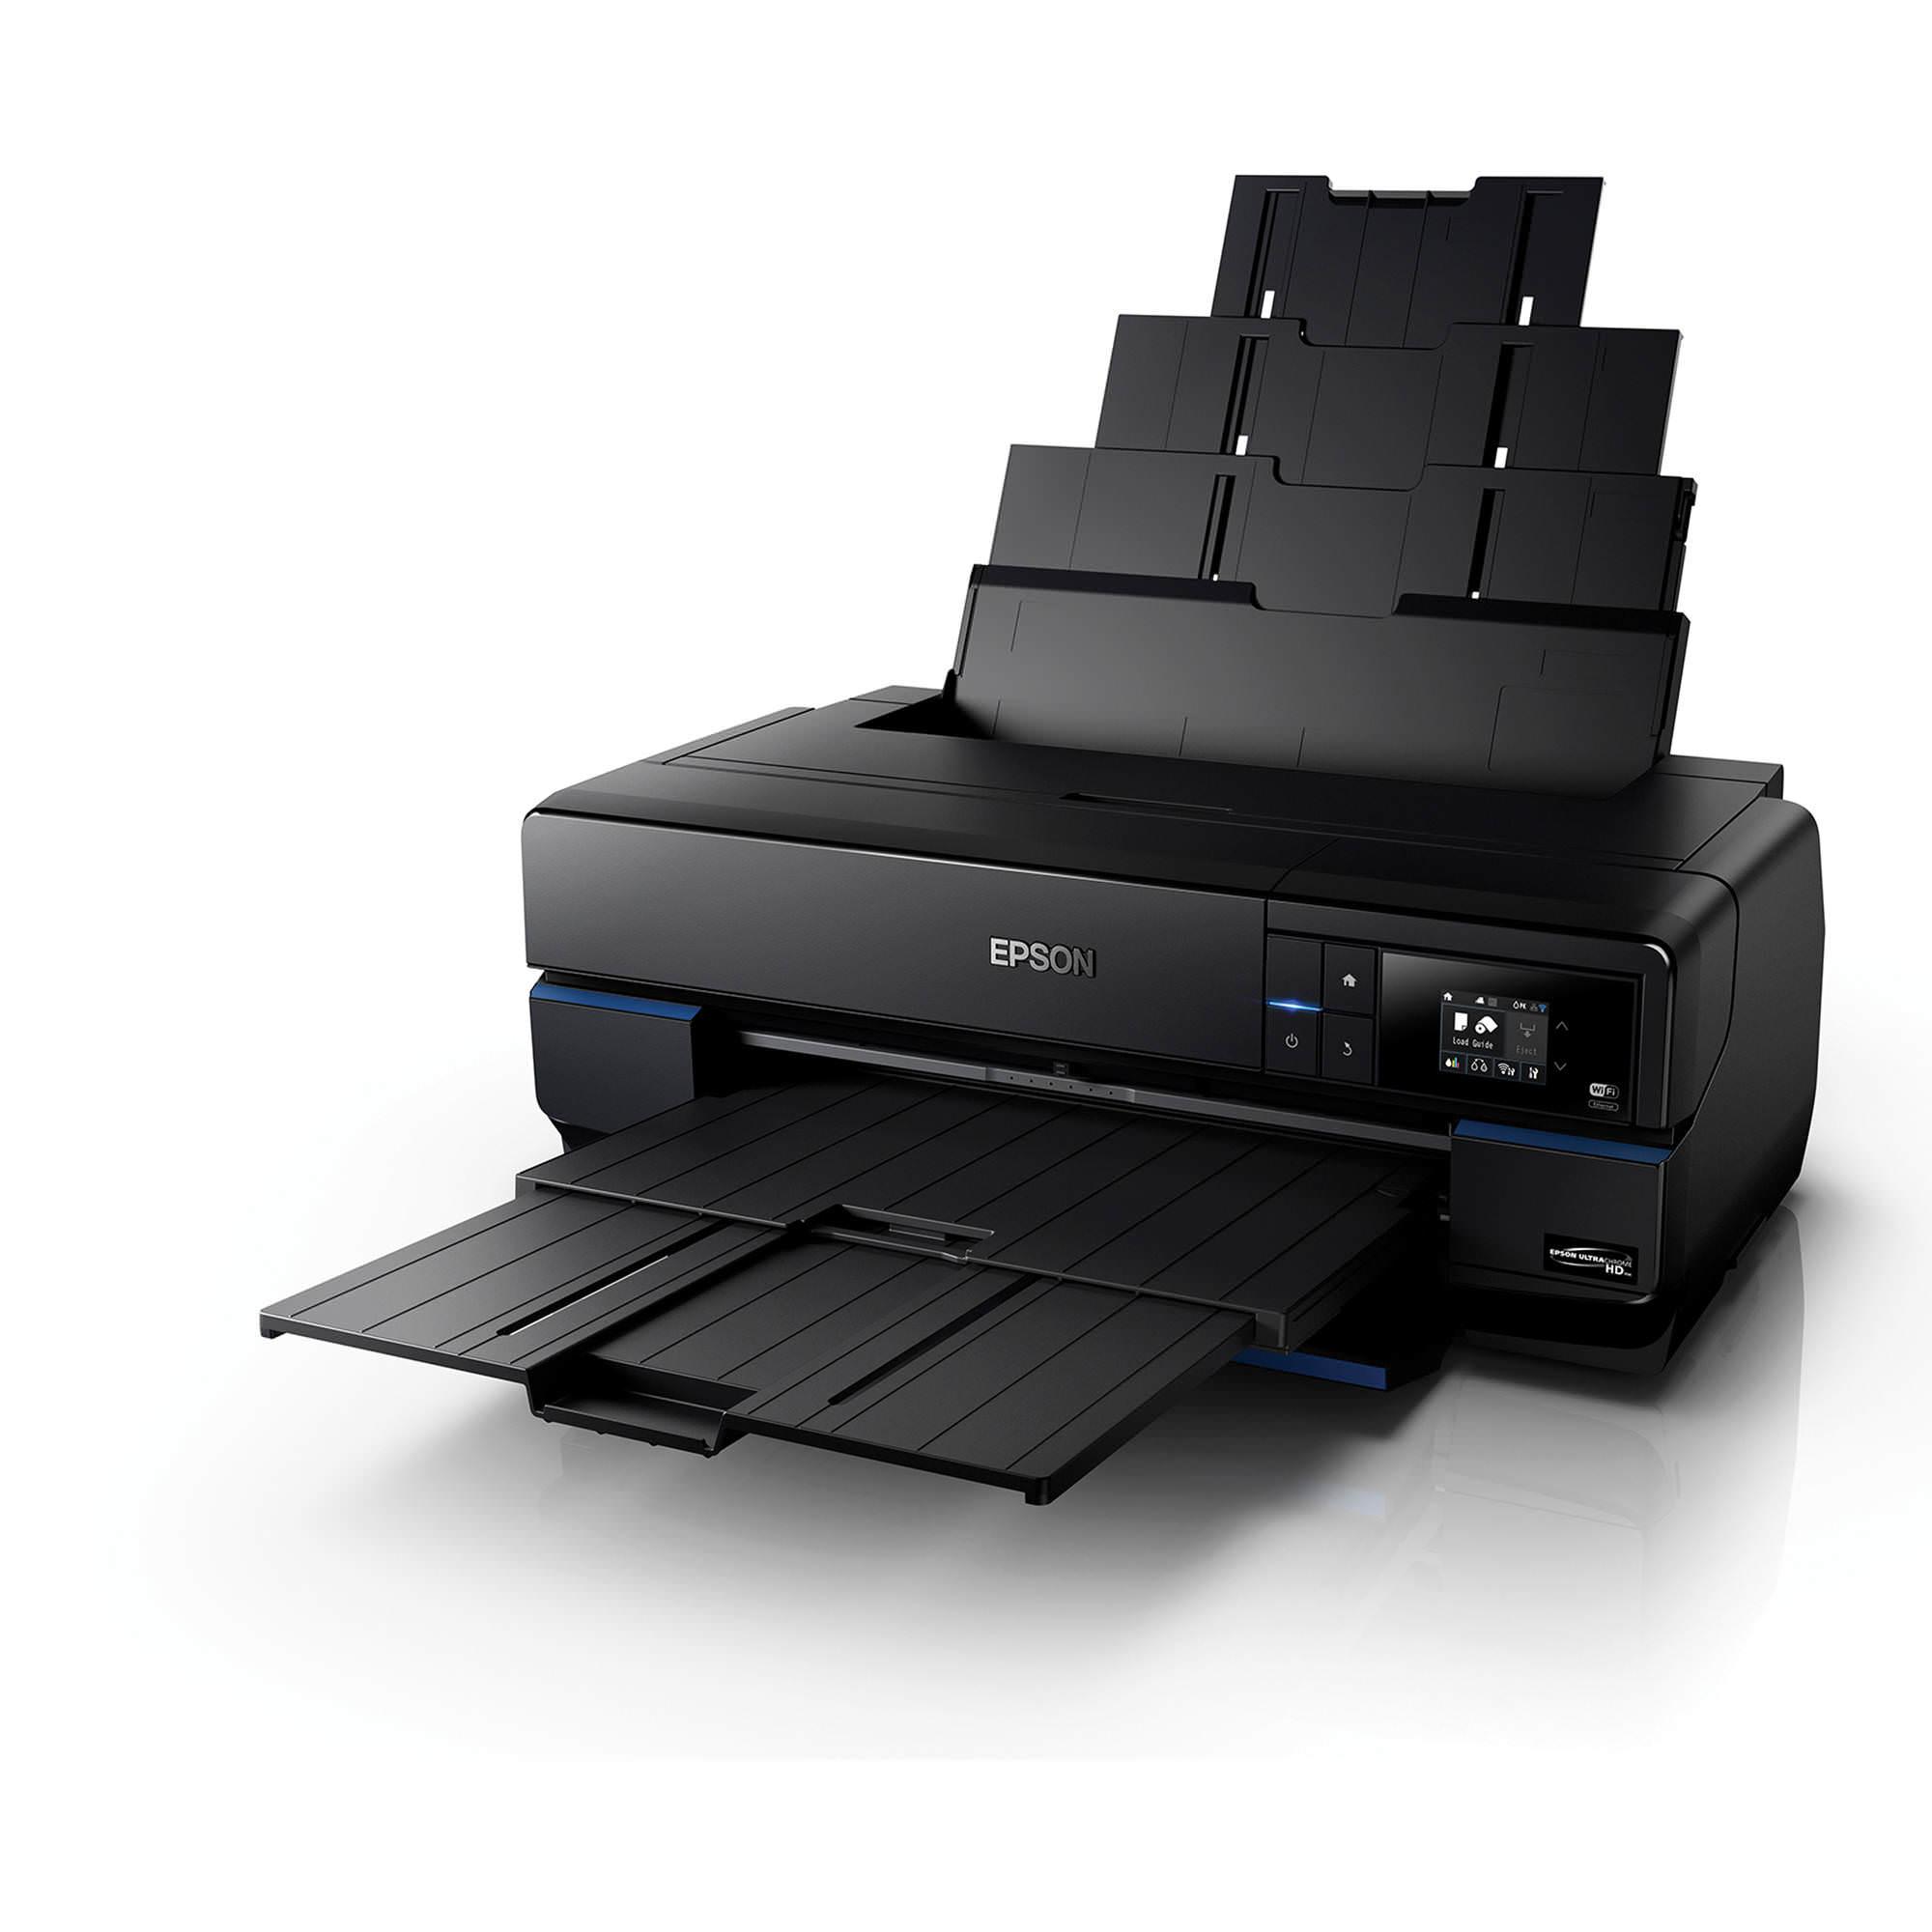 epson scp800se surecolor p800 inkjet printer 1140436 image